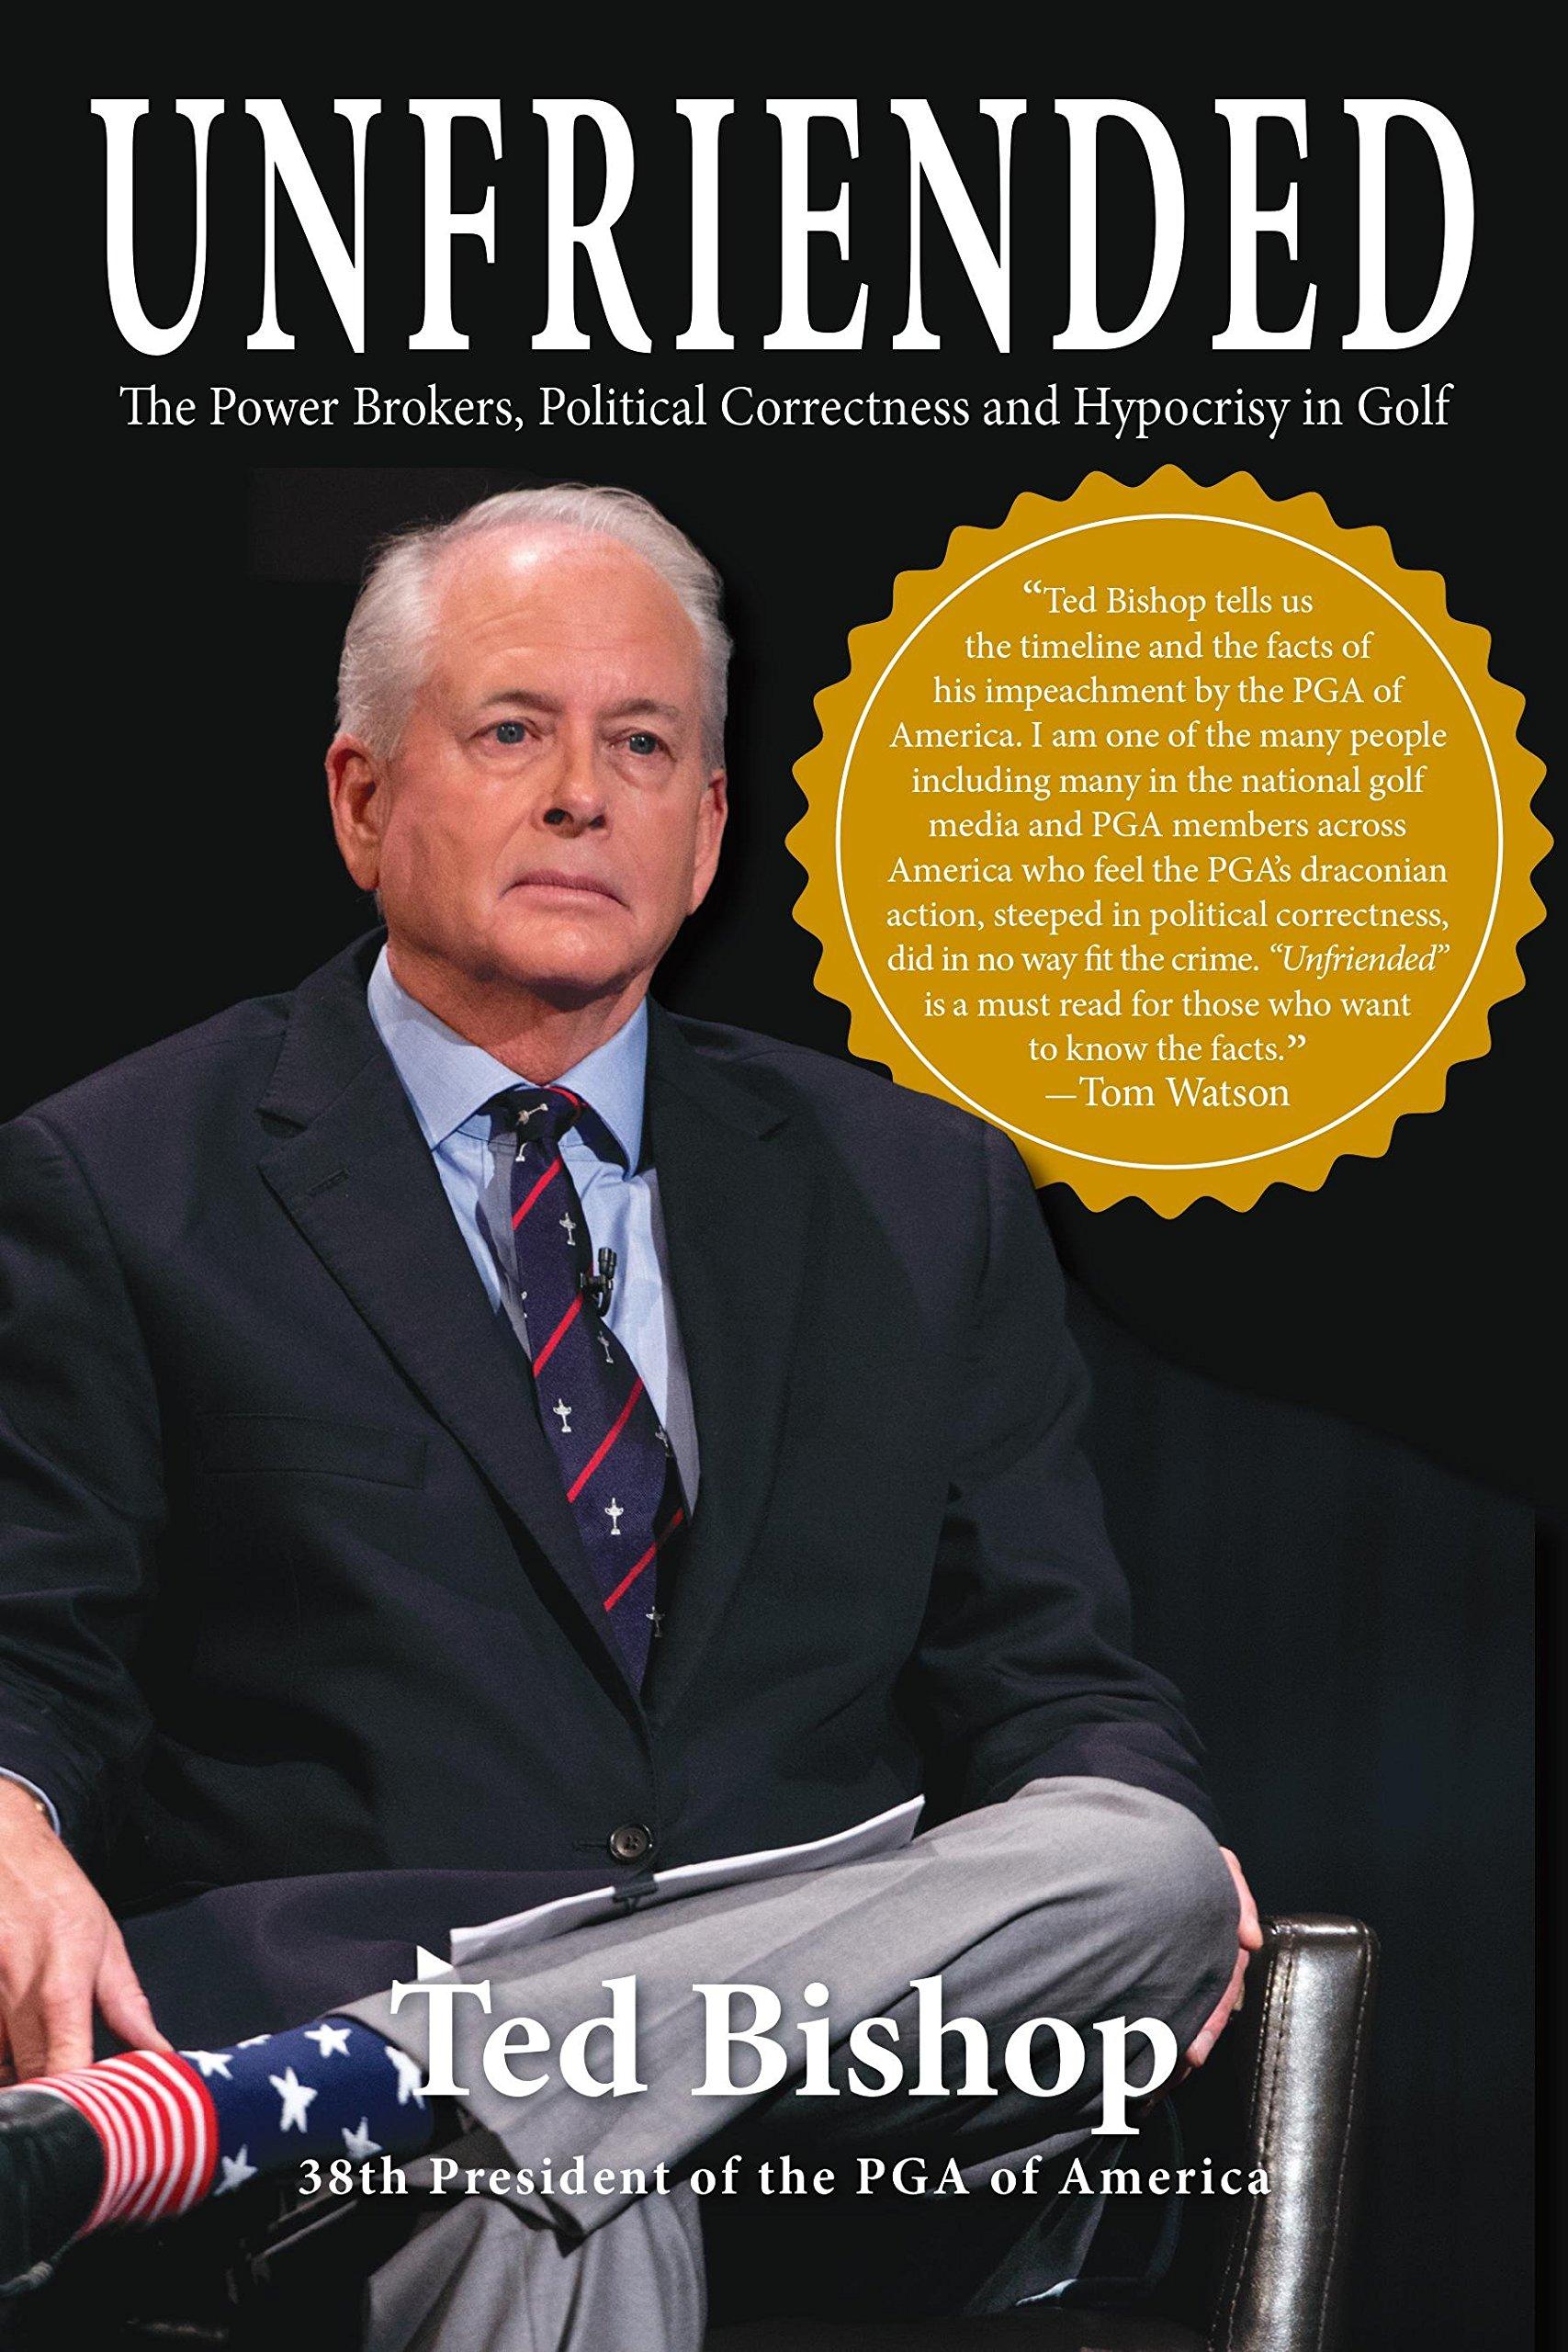 Amazon.com: Unfriended: The Power Brokers, Political Correctness ...